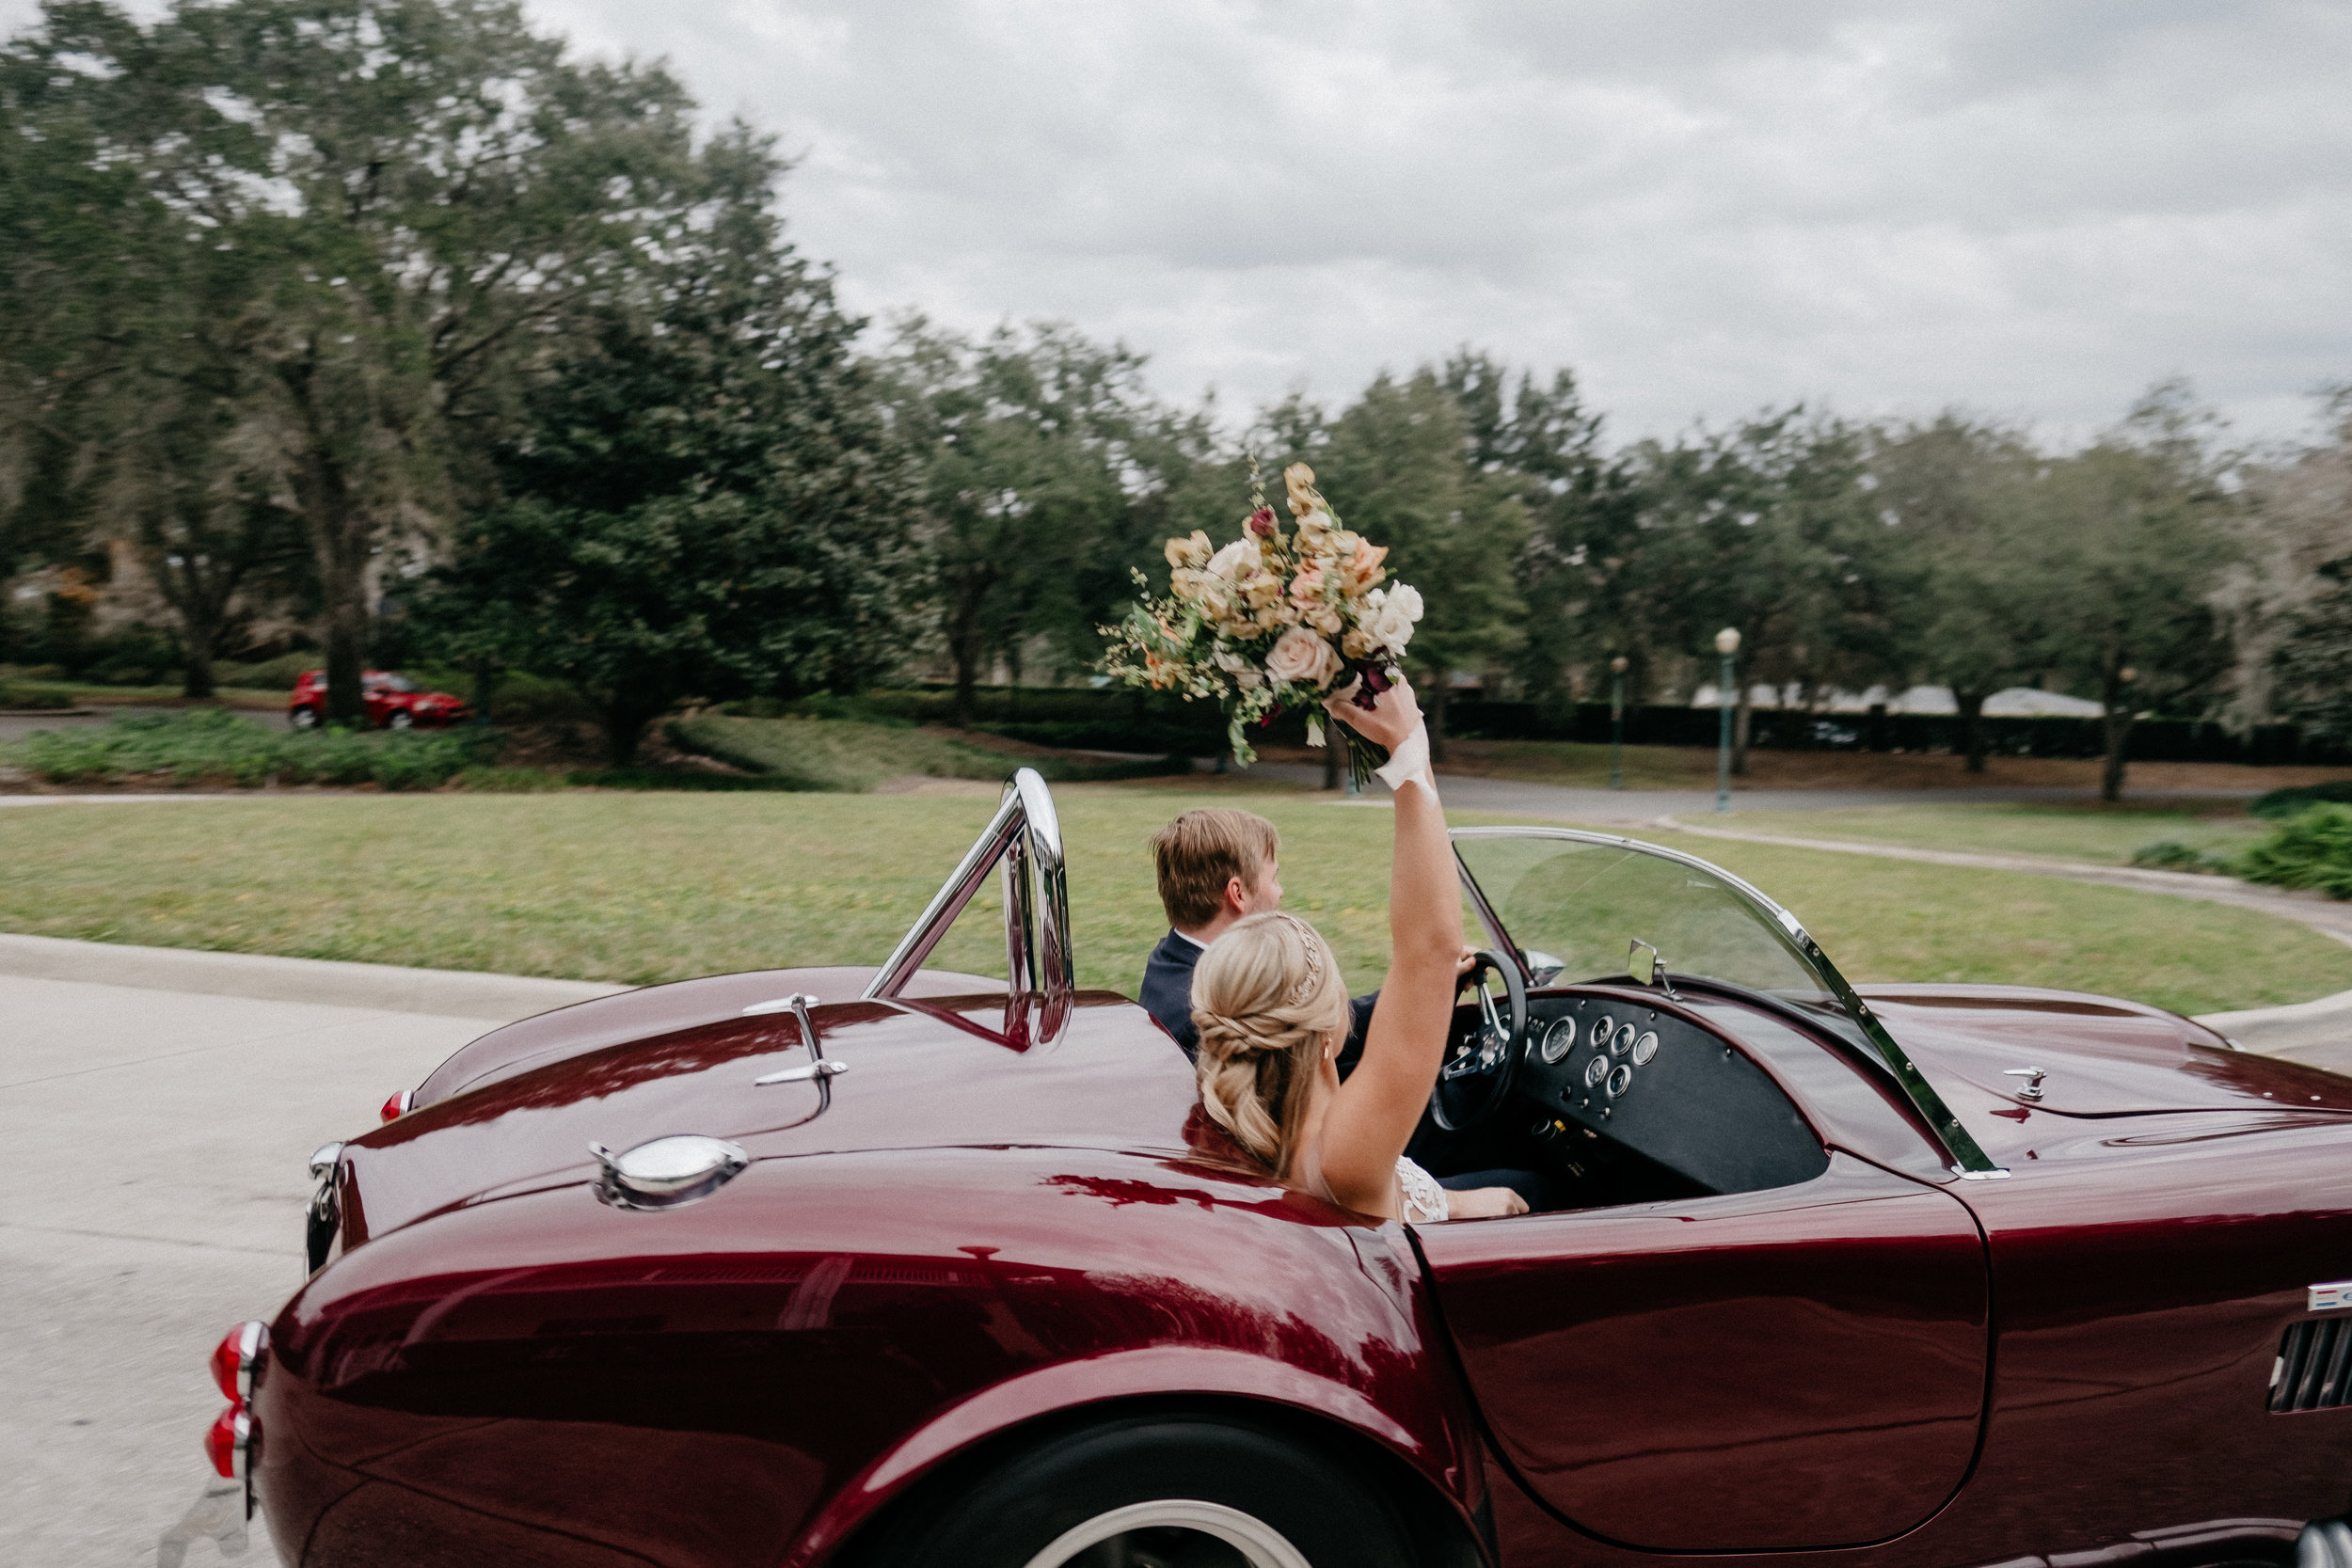 Kylie-And-Jack-Leu-Gardens-Winter-Park-Farmers-Market-Wedding-0478.jpg